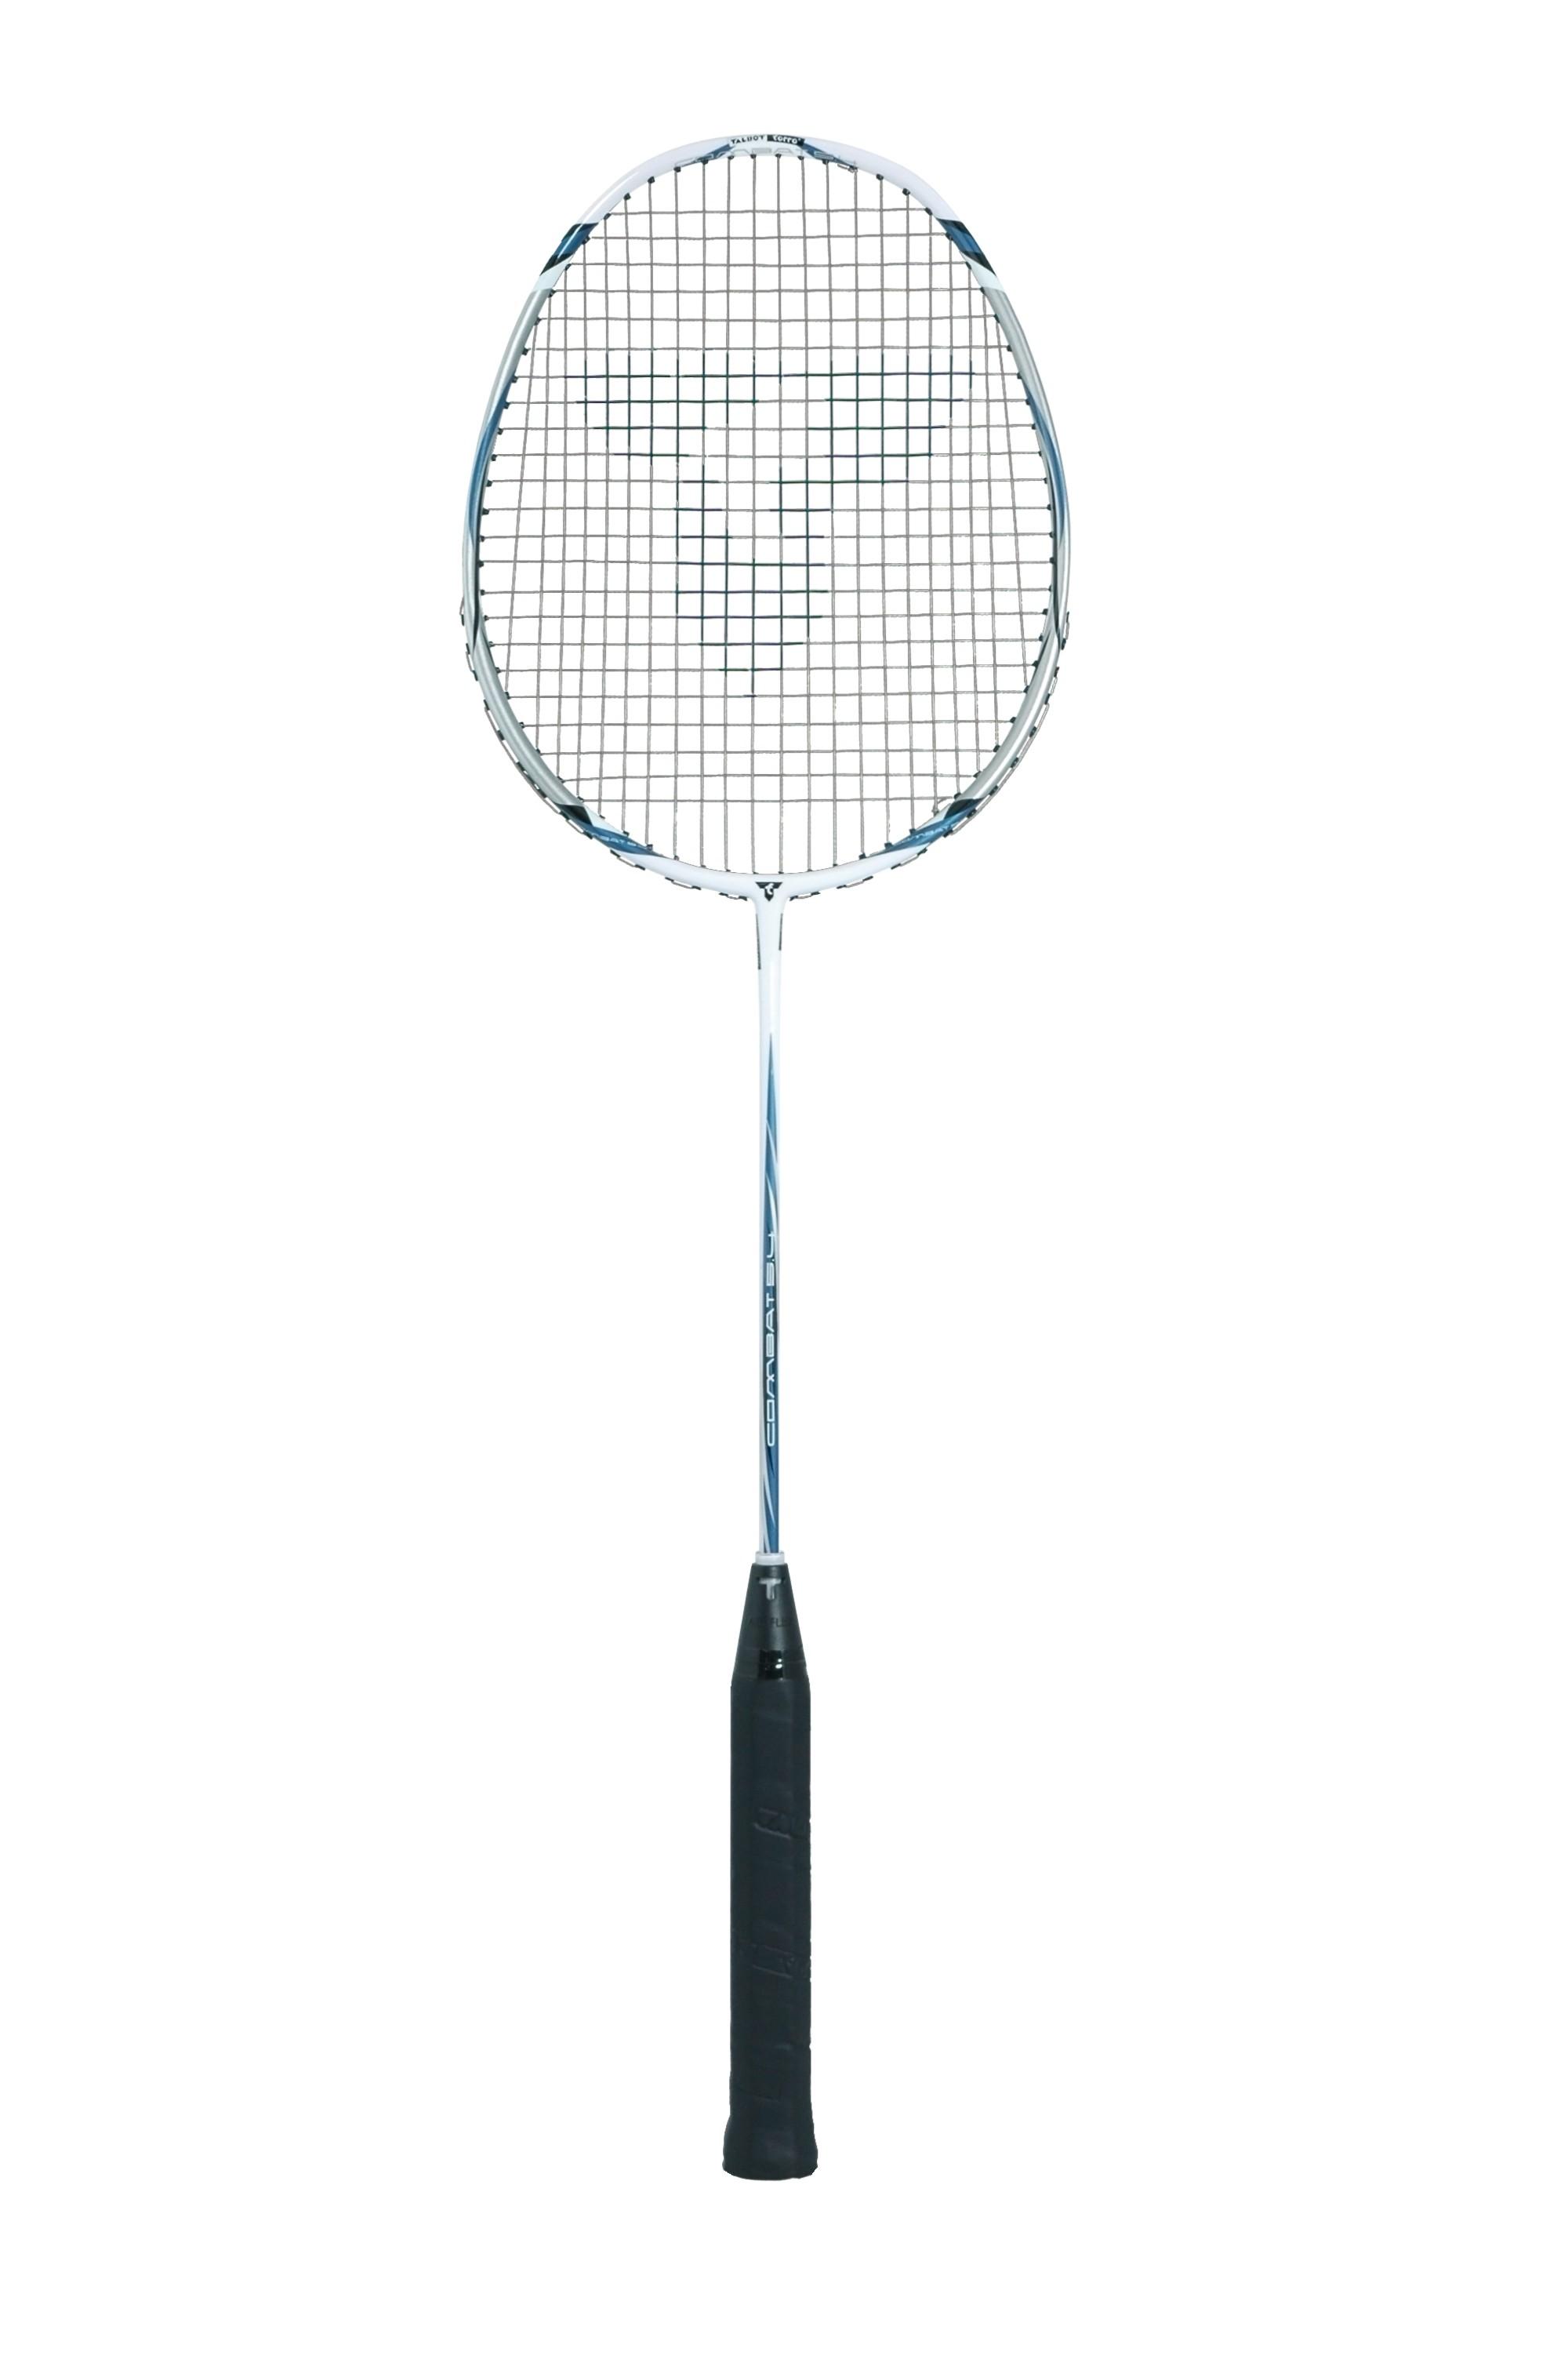 Racheta Badminton  Talbot Torro  Combat Airflex 5.4  98 G